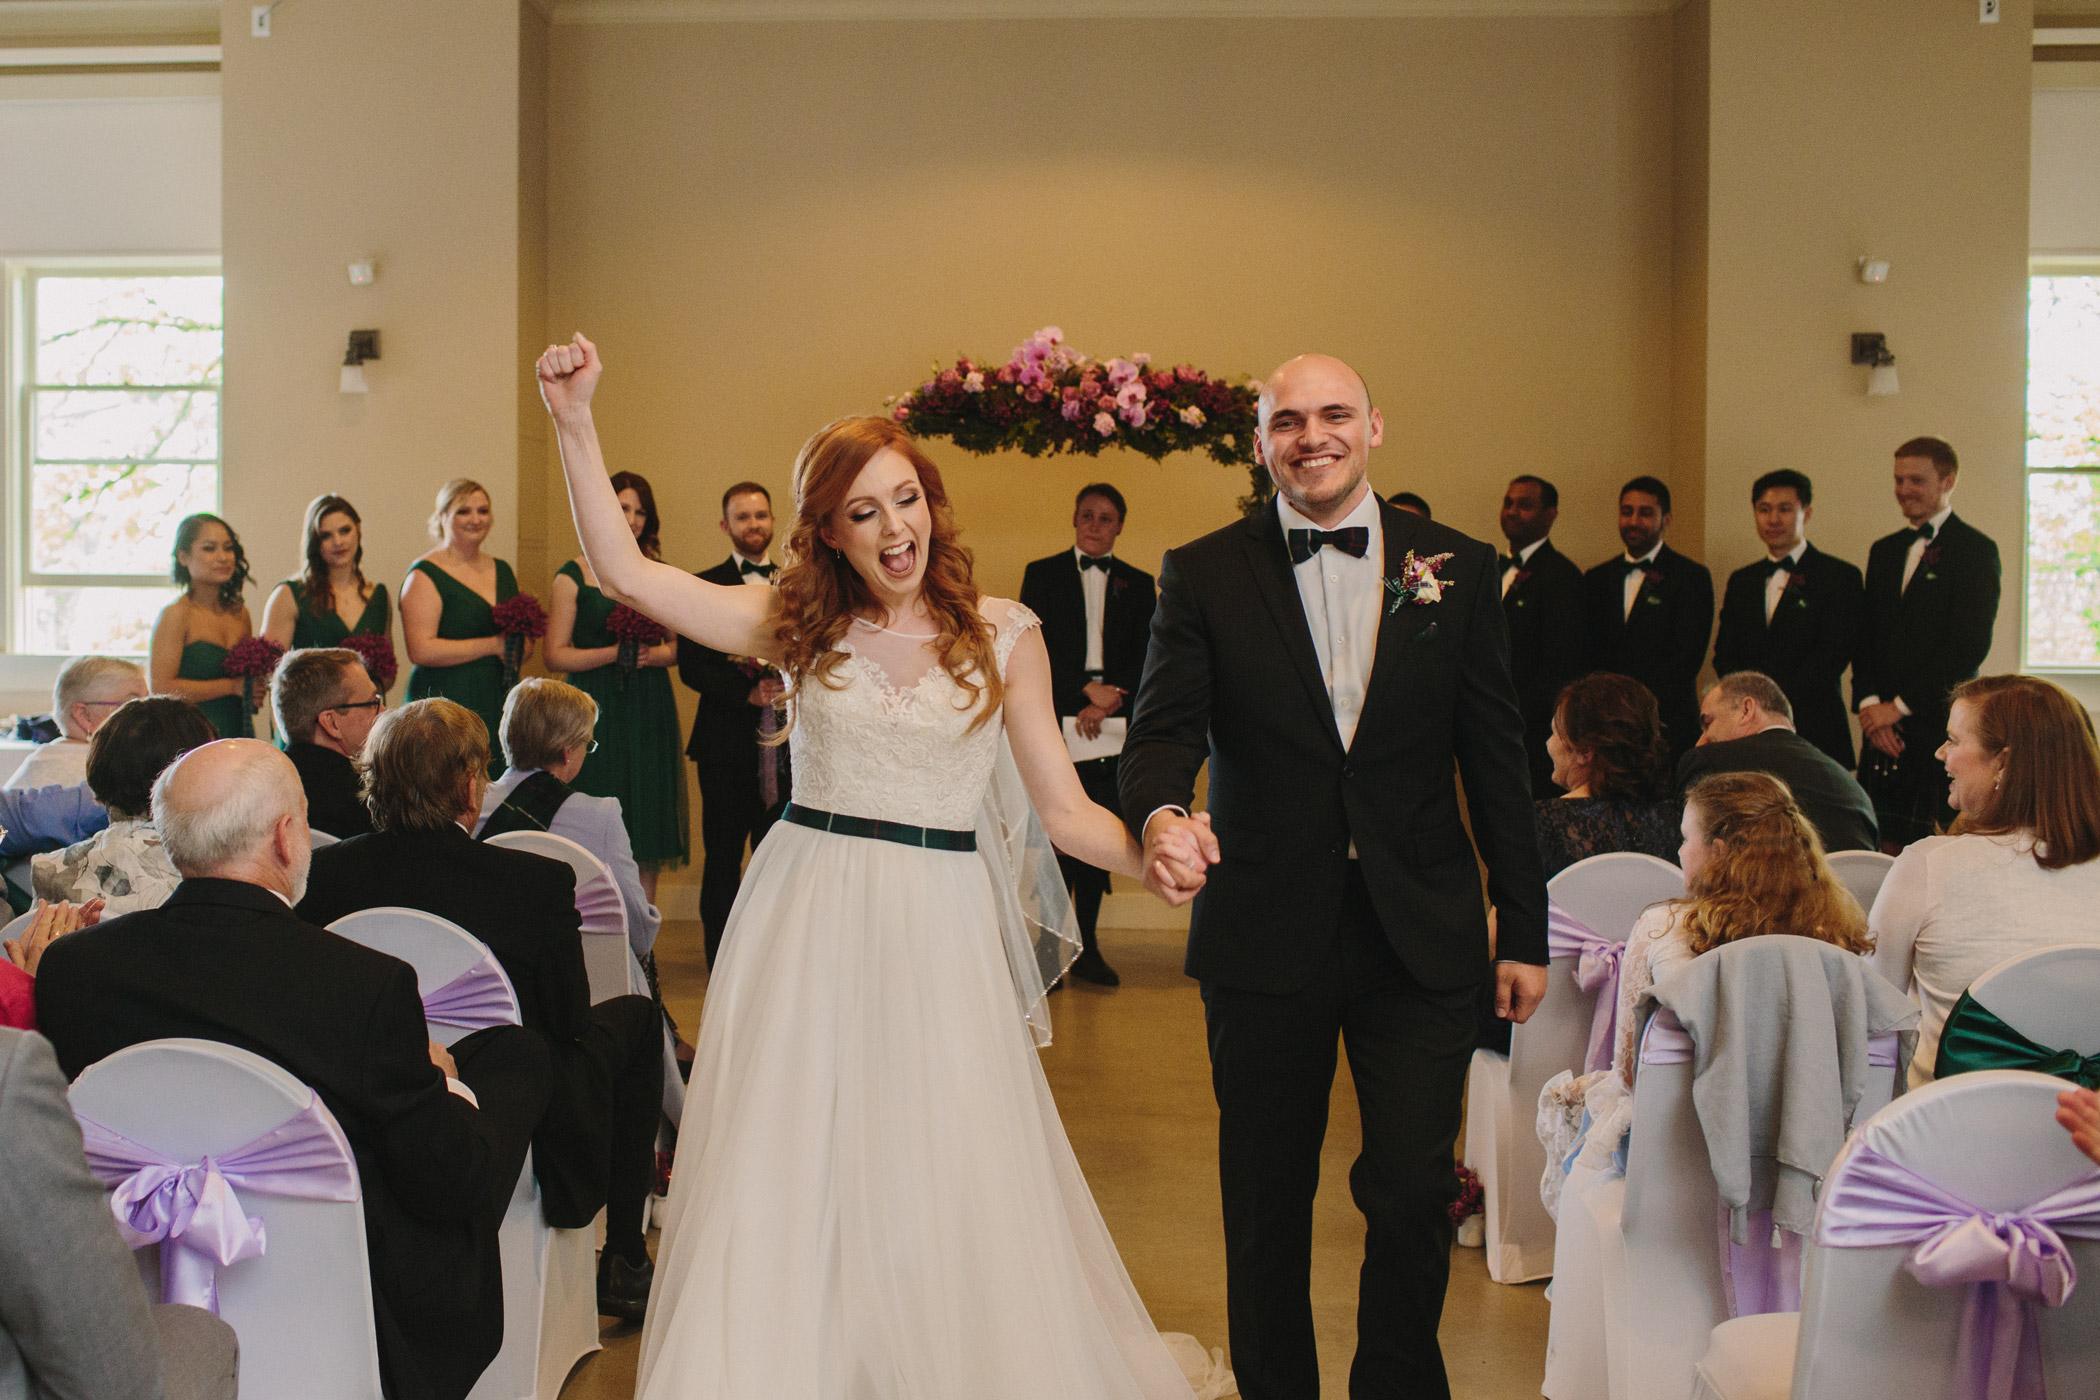 Wedding Ceremony at Alana Emmott Centre